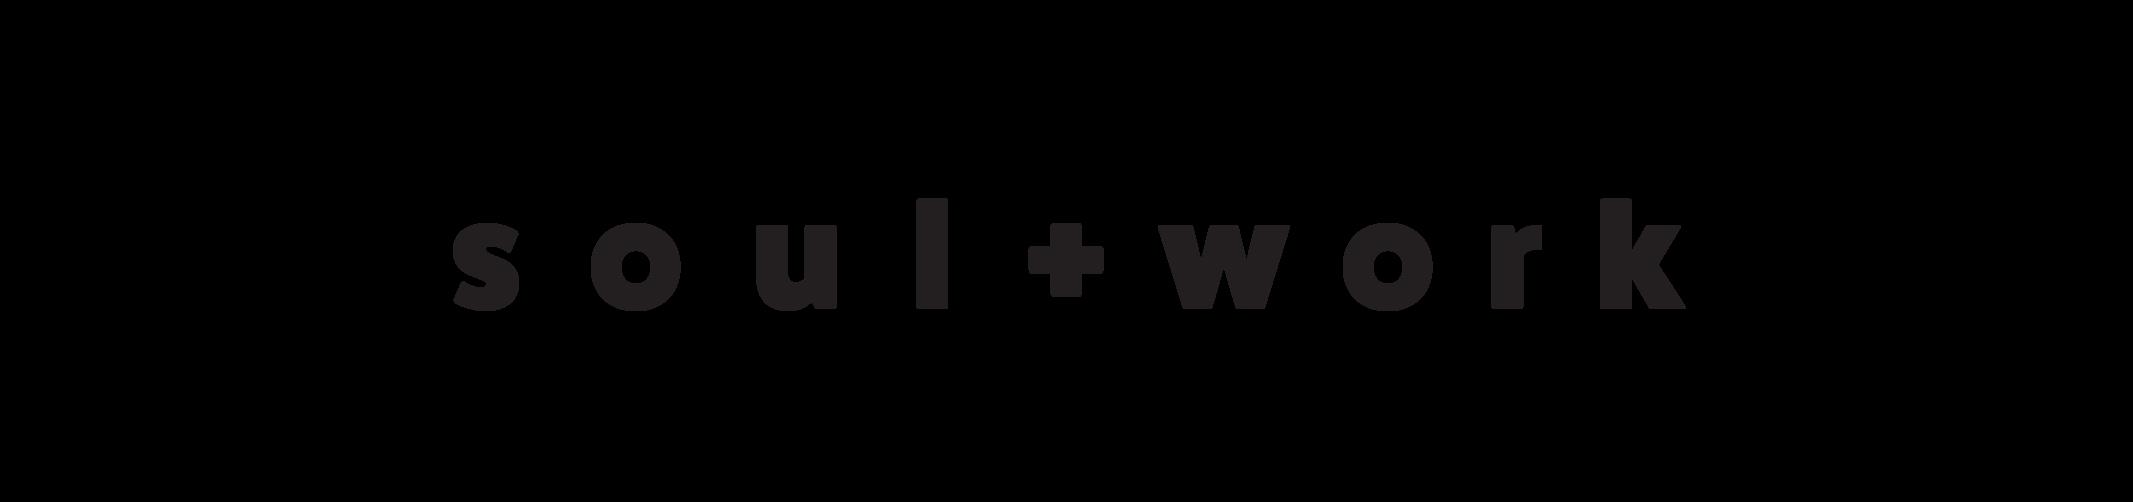 soul+work logo- new-black-01.png